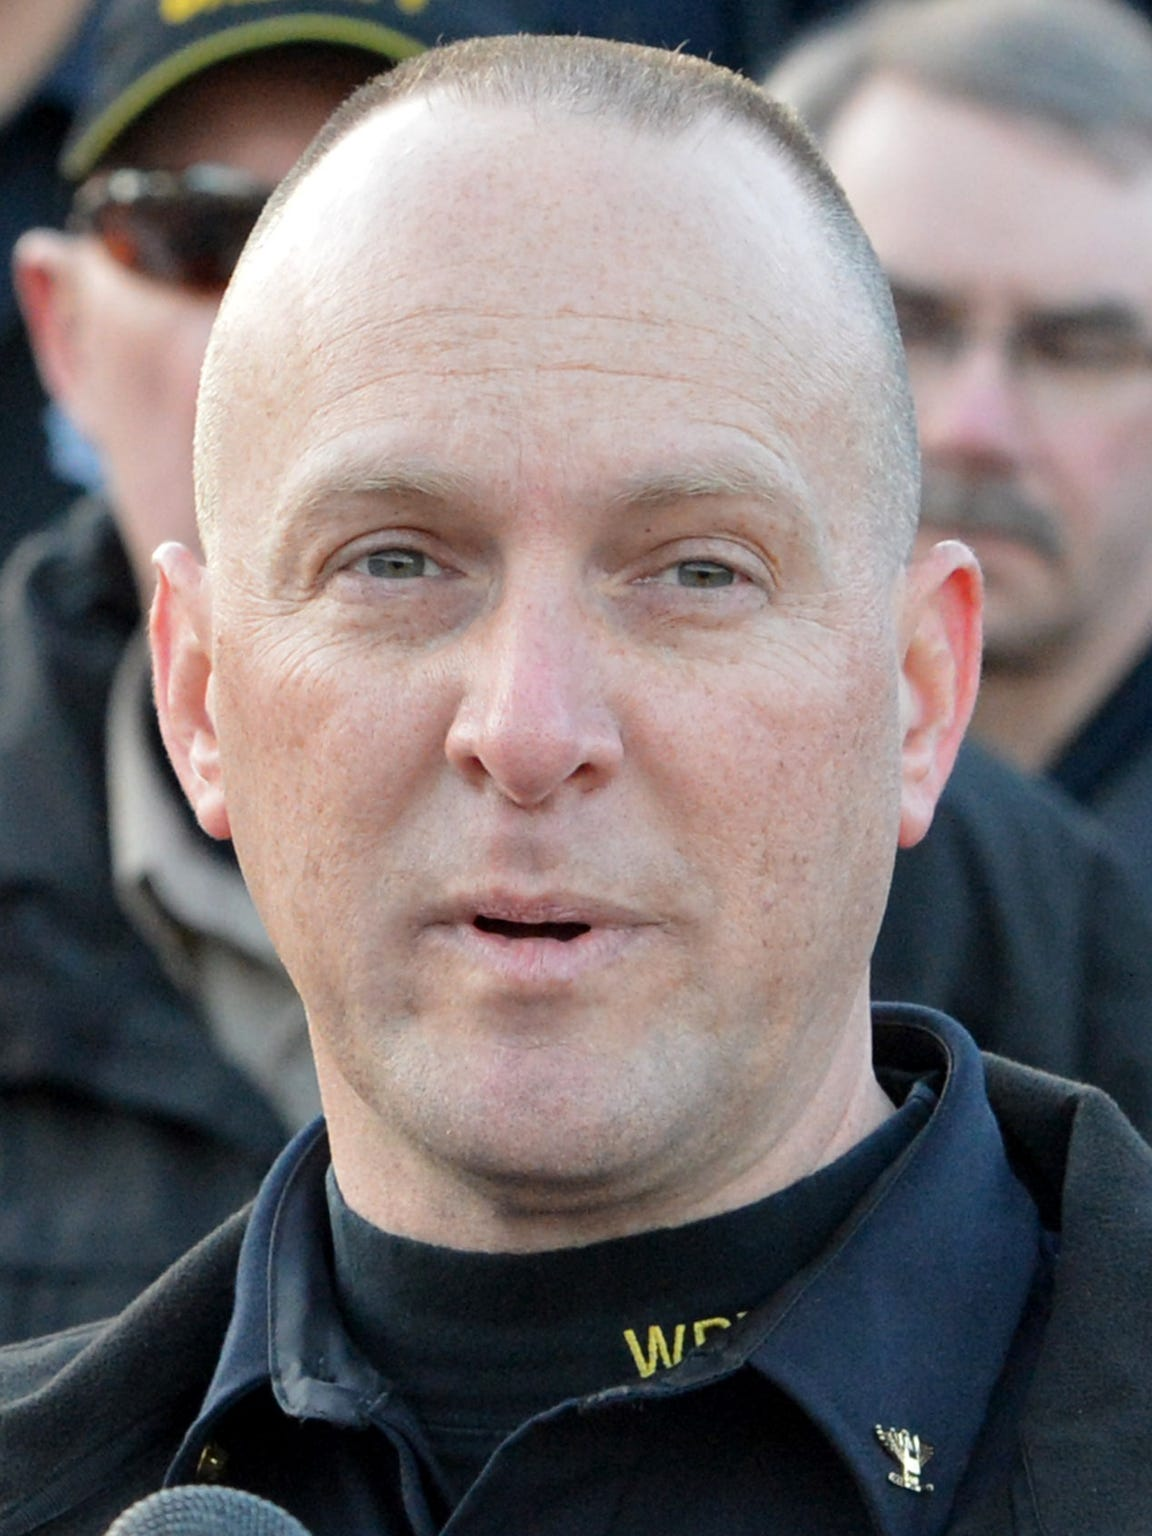 Waynesboro Police Chief Michael Wilhelm in 2014.  Here